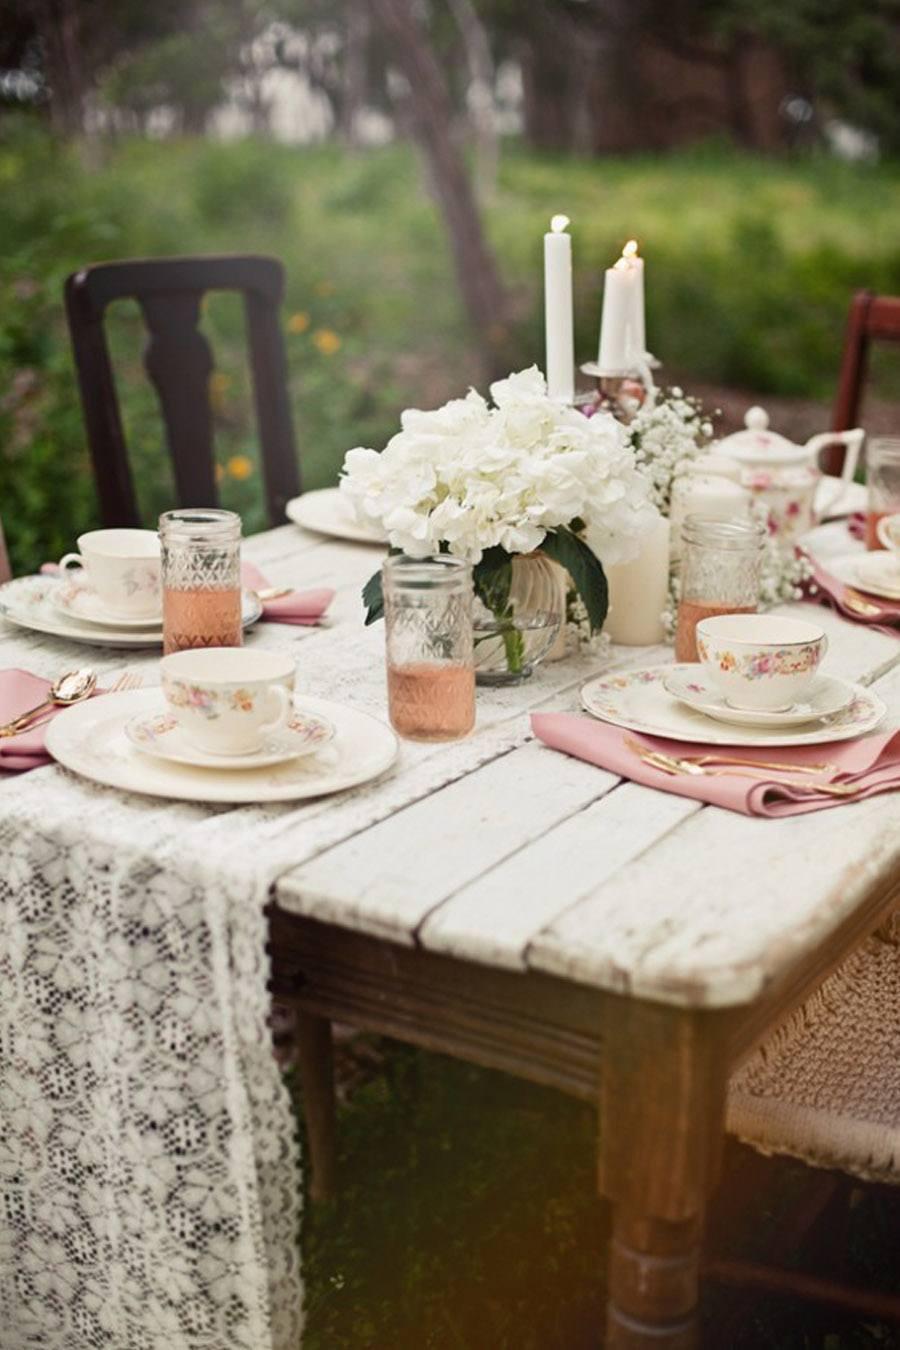 Caminos de mesa de encaje blog de bodas de una boda original for Caminos para mesas